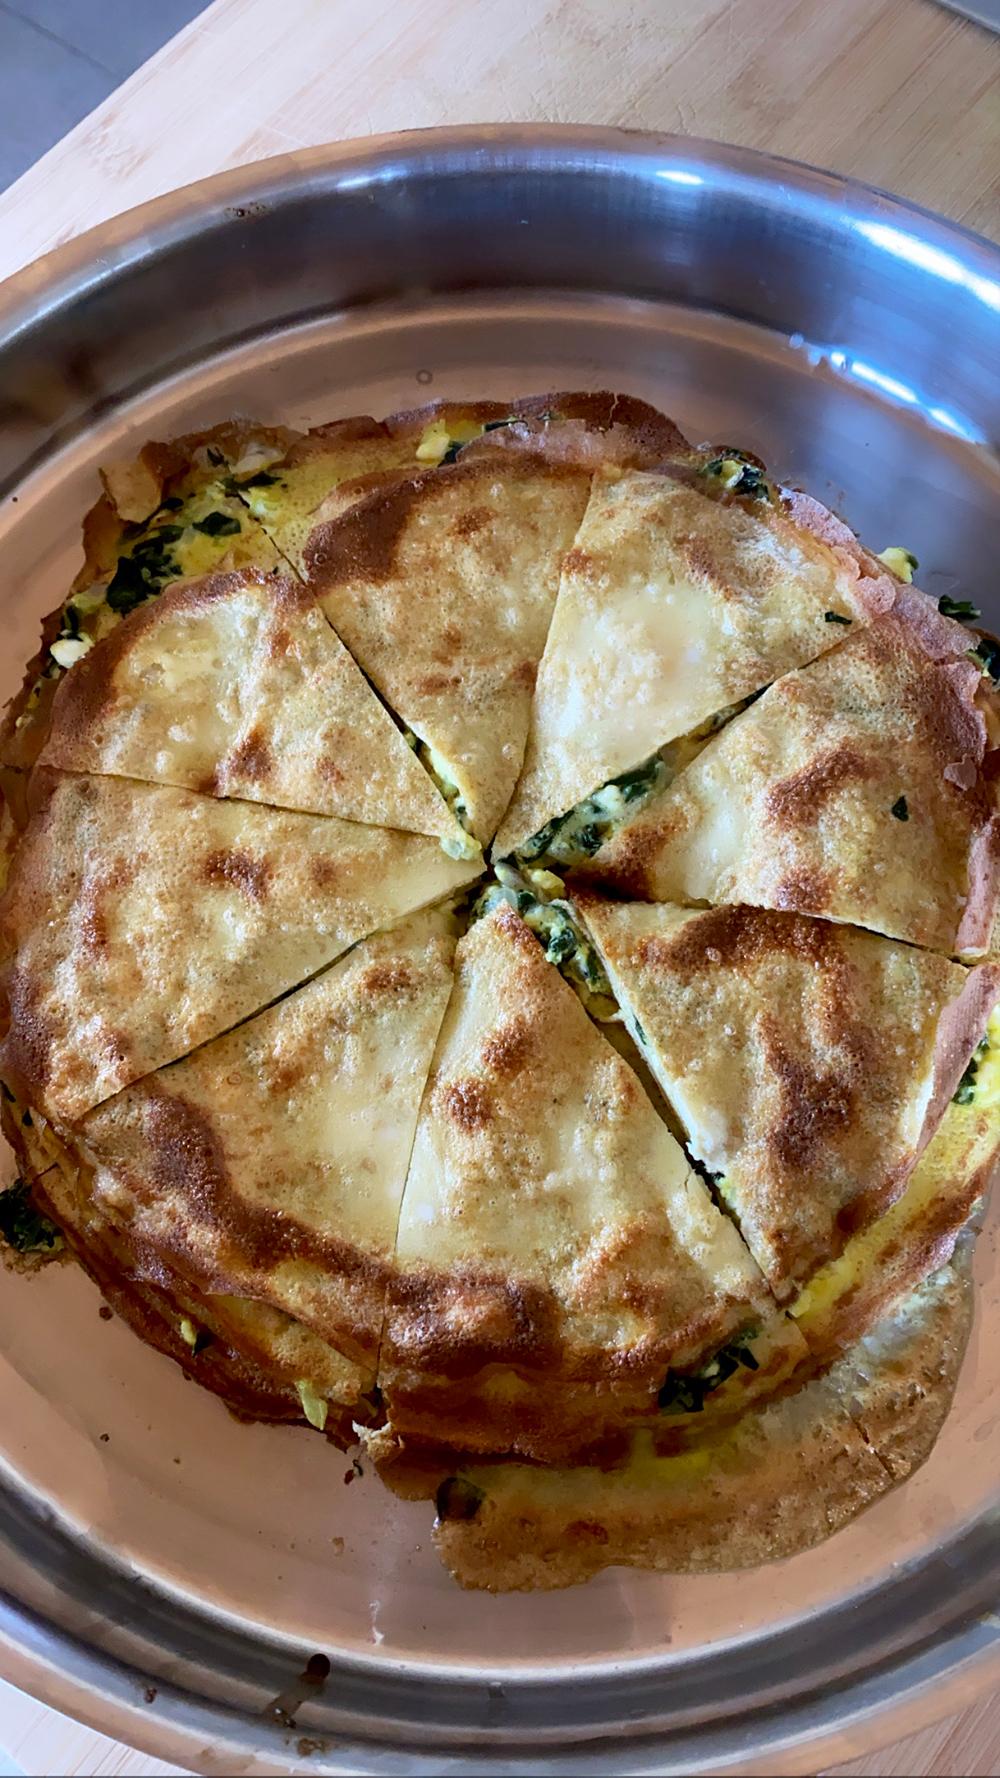 spanakopita, crepe, gluten free, low carb, spinach pie, crepini